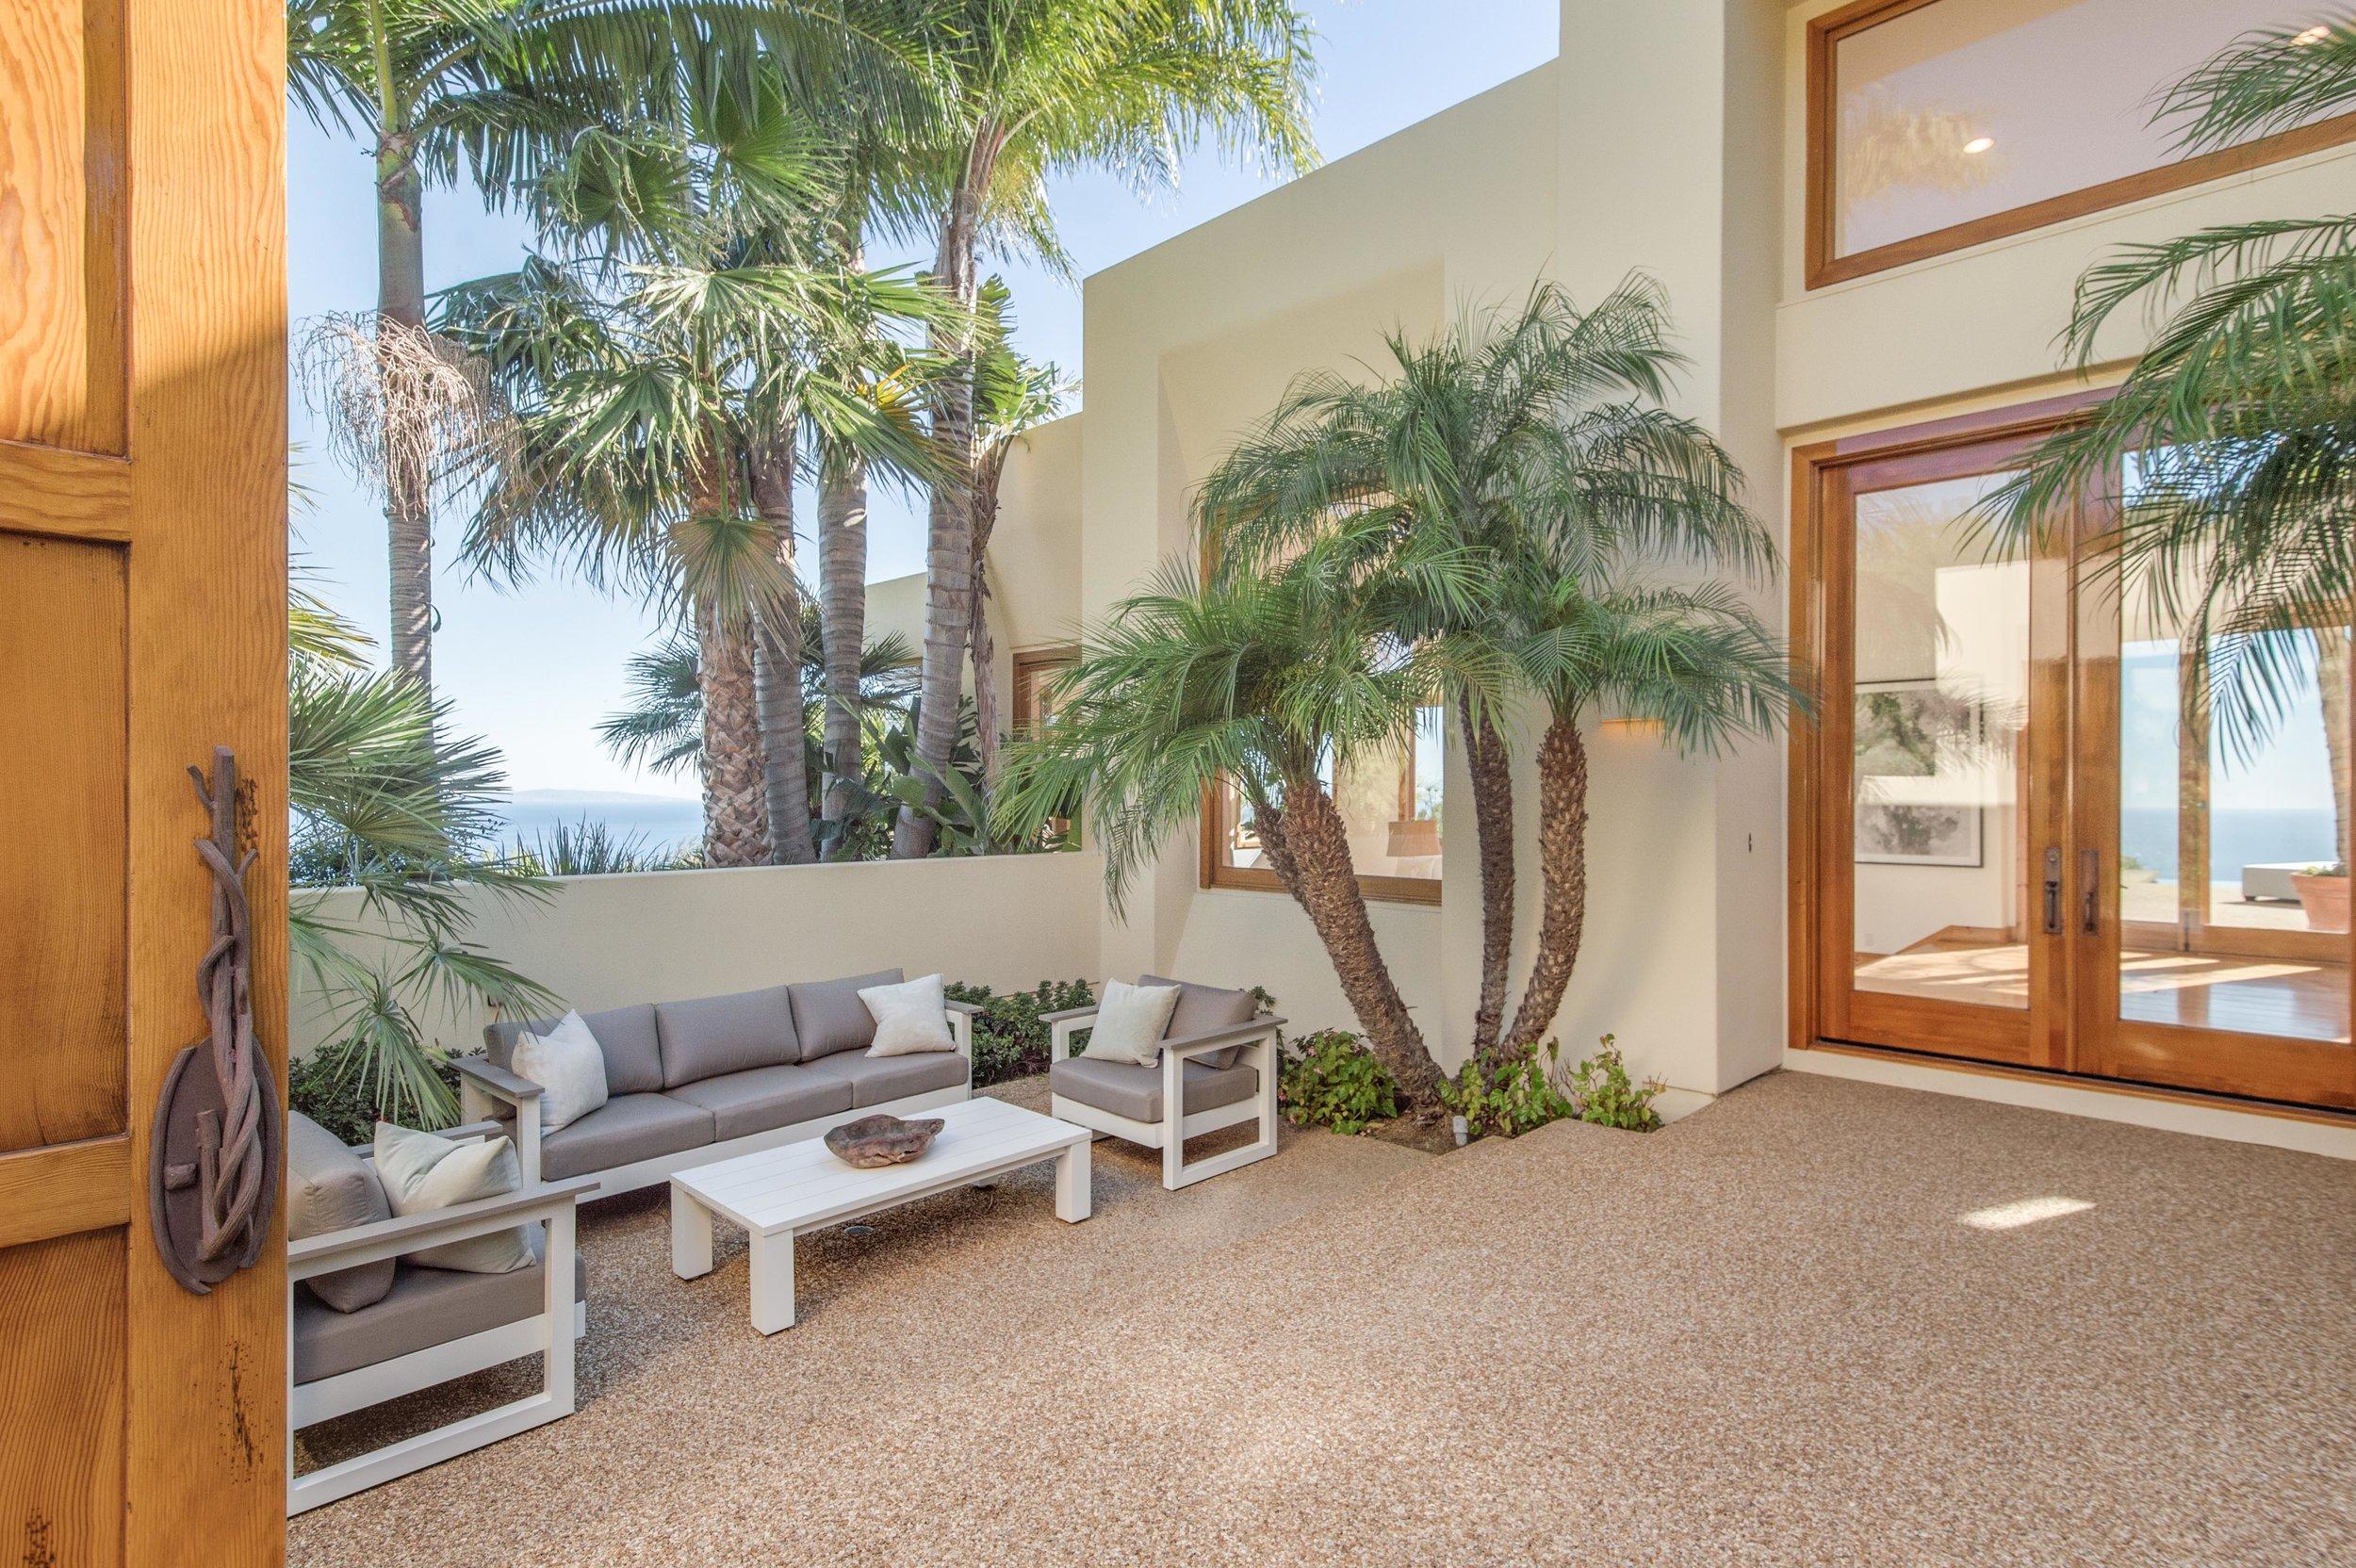 025 Entry 27475 Latigo Bay View Drive For Sale Lease The Malibu Life Team Luxury Real Estate.jpg